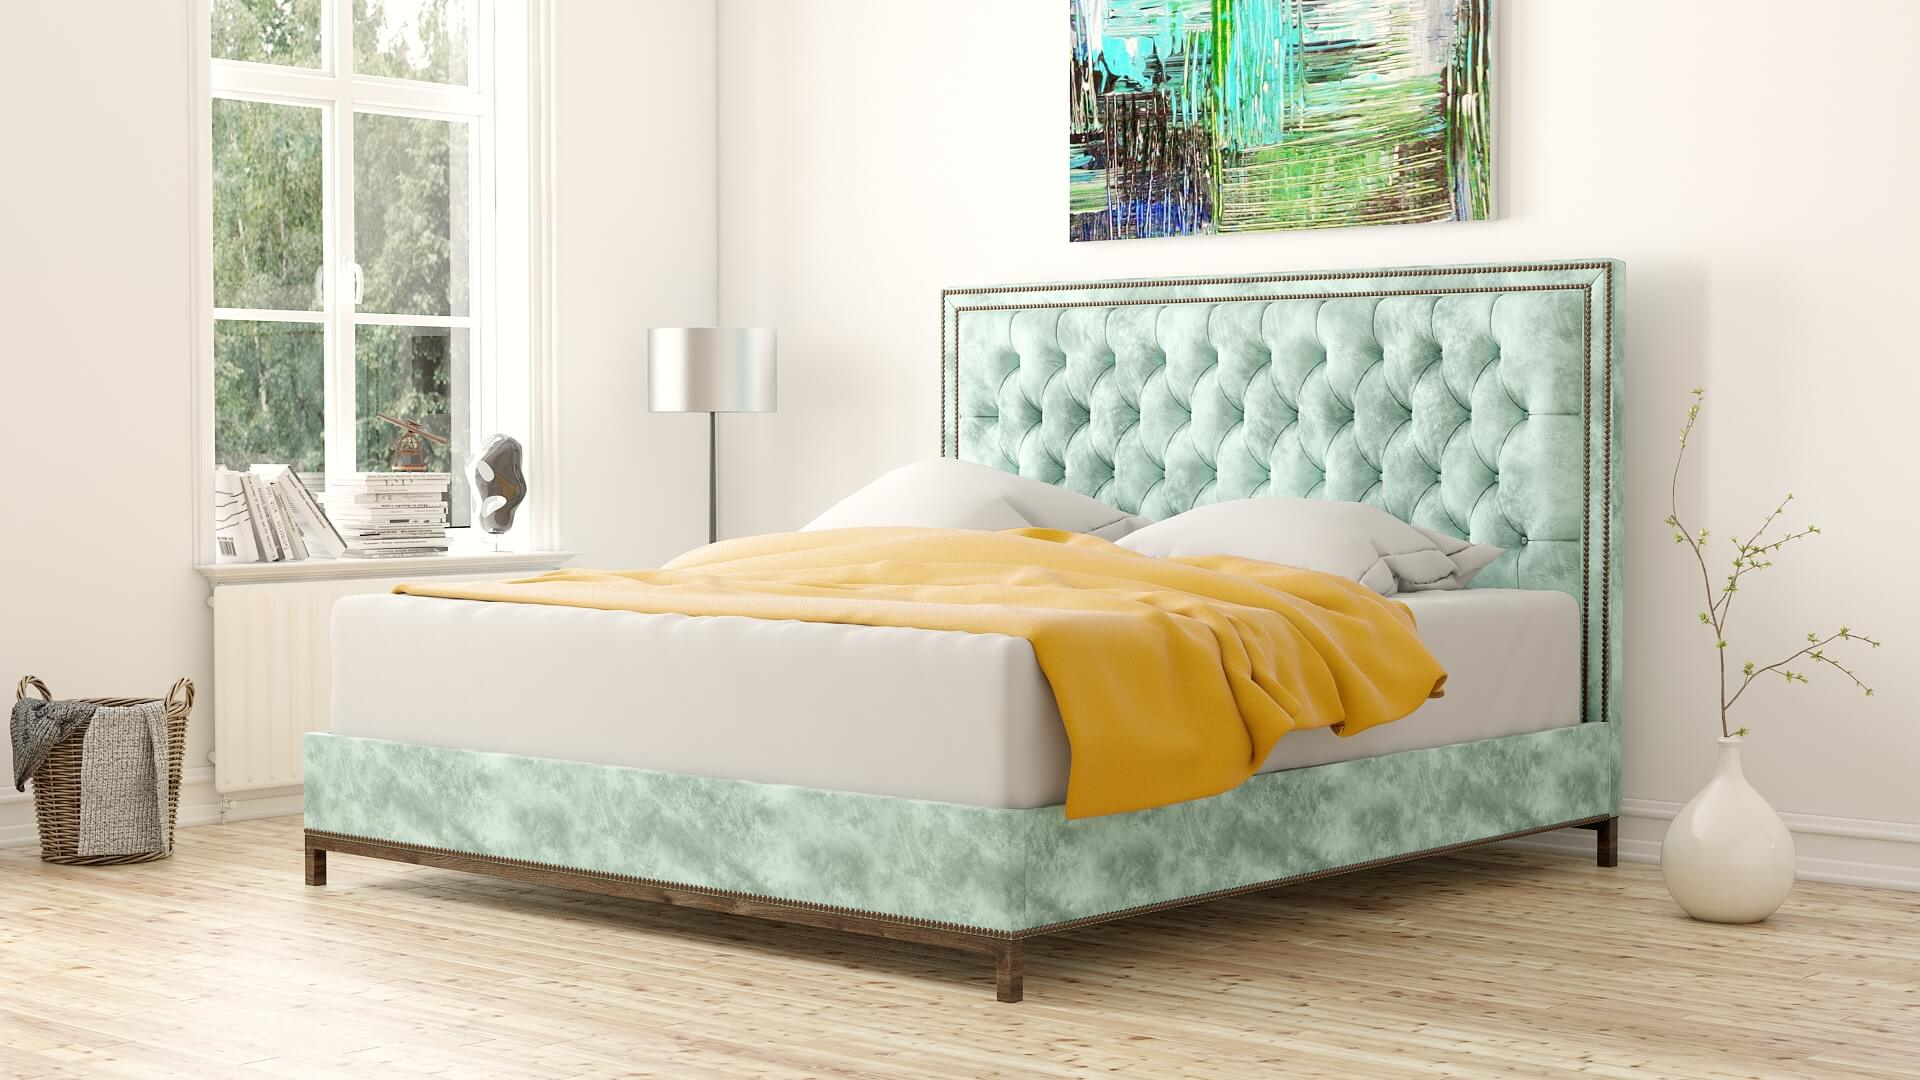 heidi bed furniture gallery 3